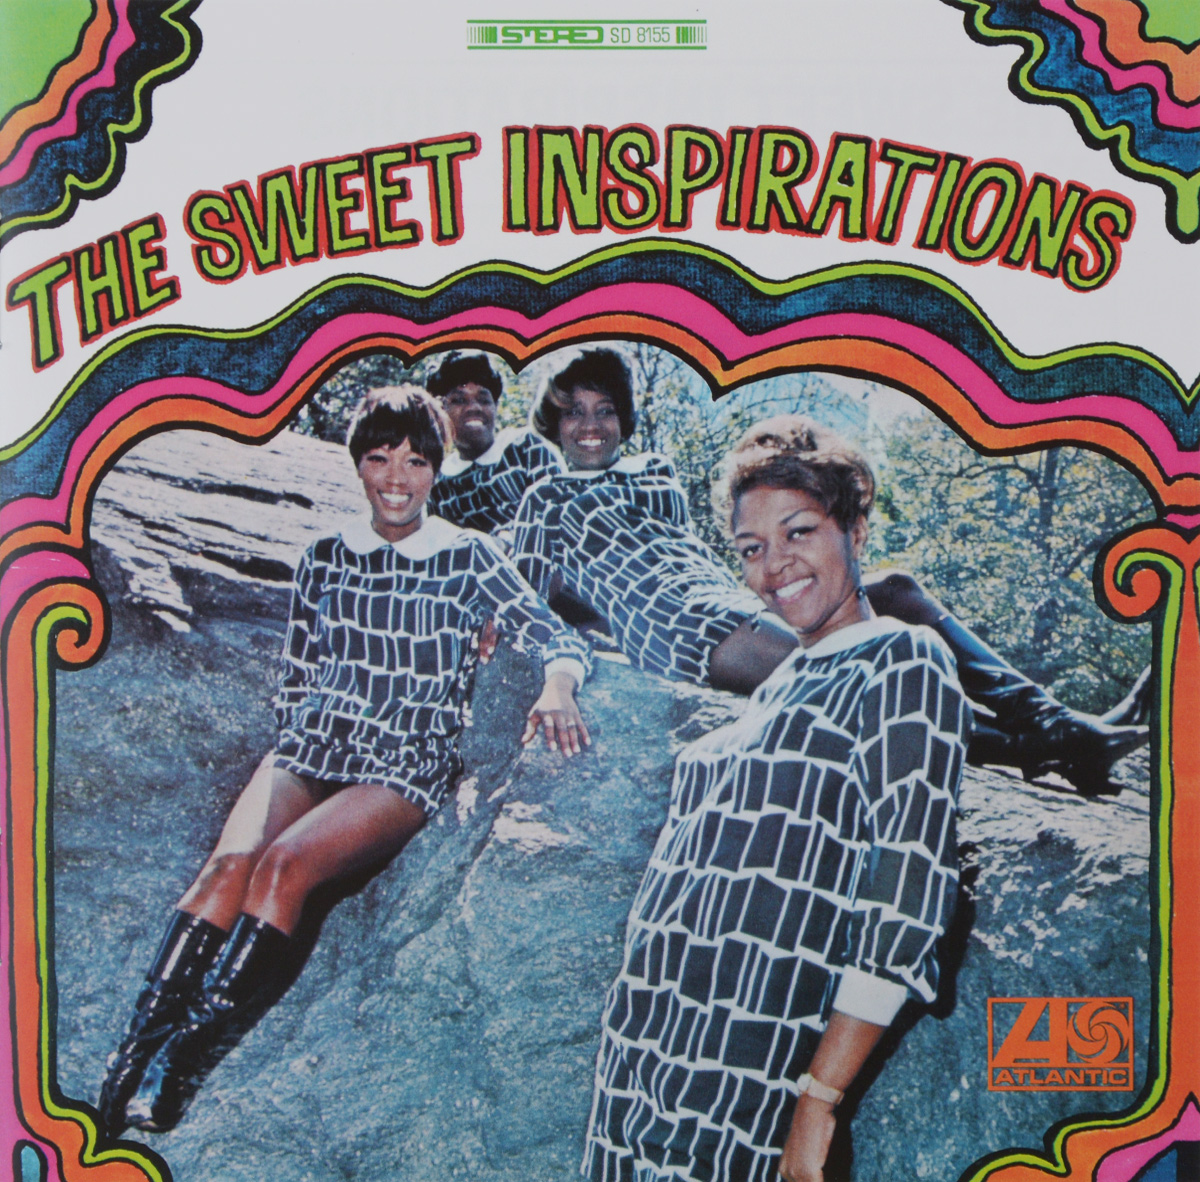 The Sweet Inspirations. The Sweet Inspirations